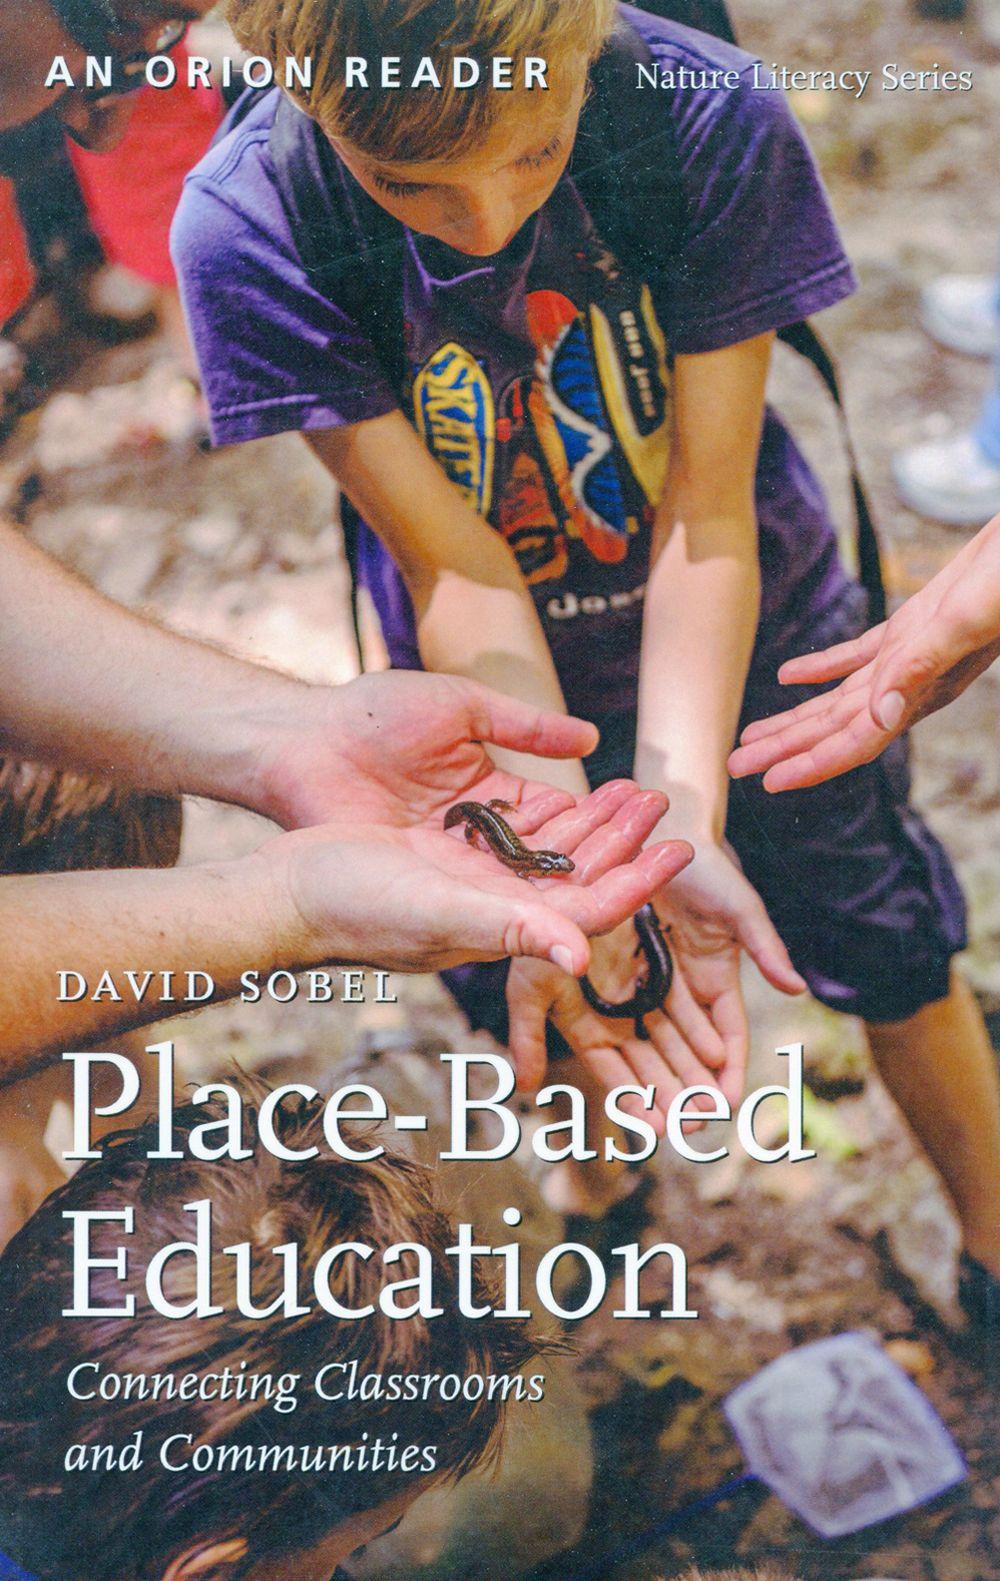 Place Based Education by David Sobel.jpg